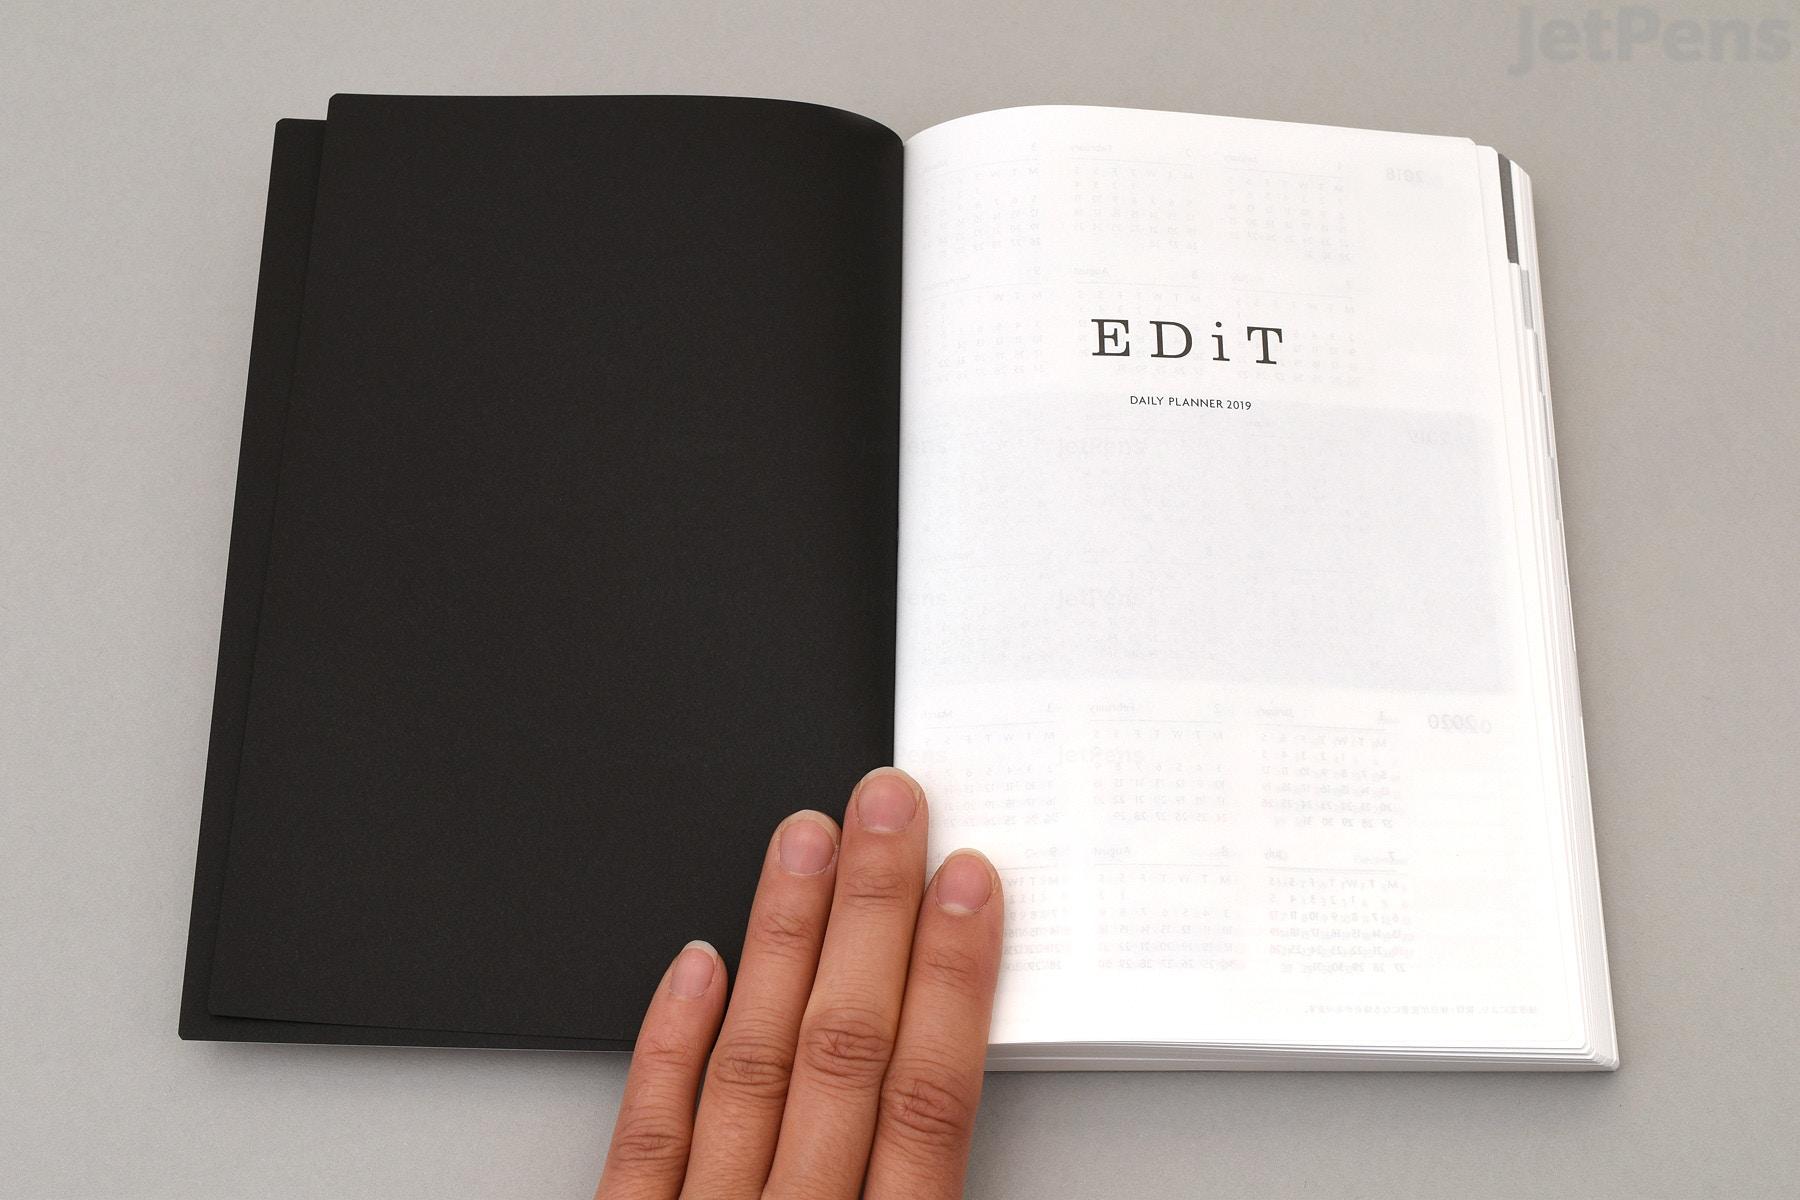 Marks Edit Daily Planner 2019 Refill B6 2 Books Ballpoint Pen Tip And Diagram